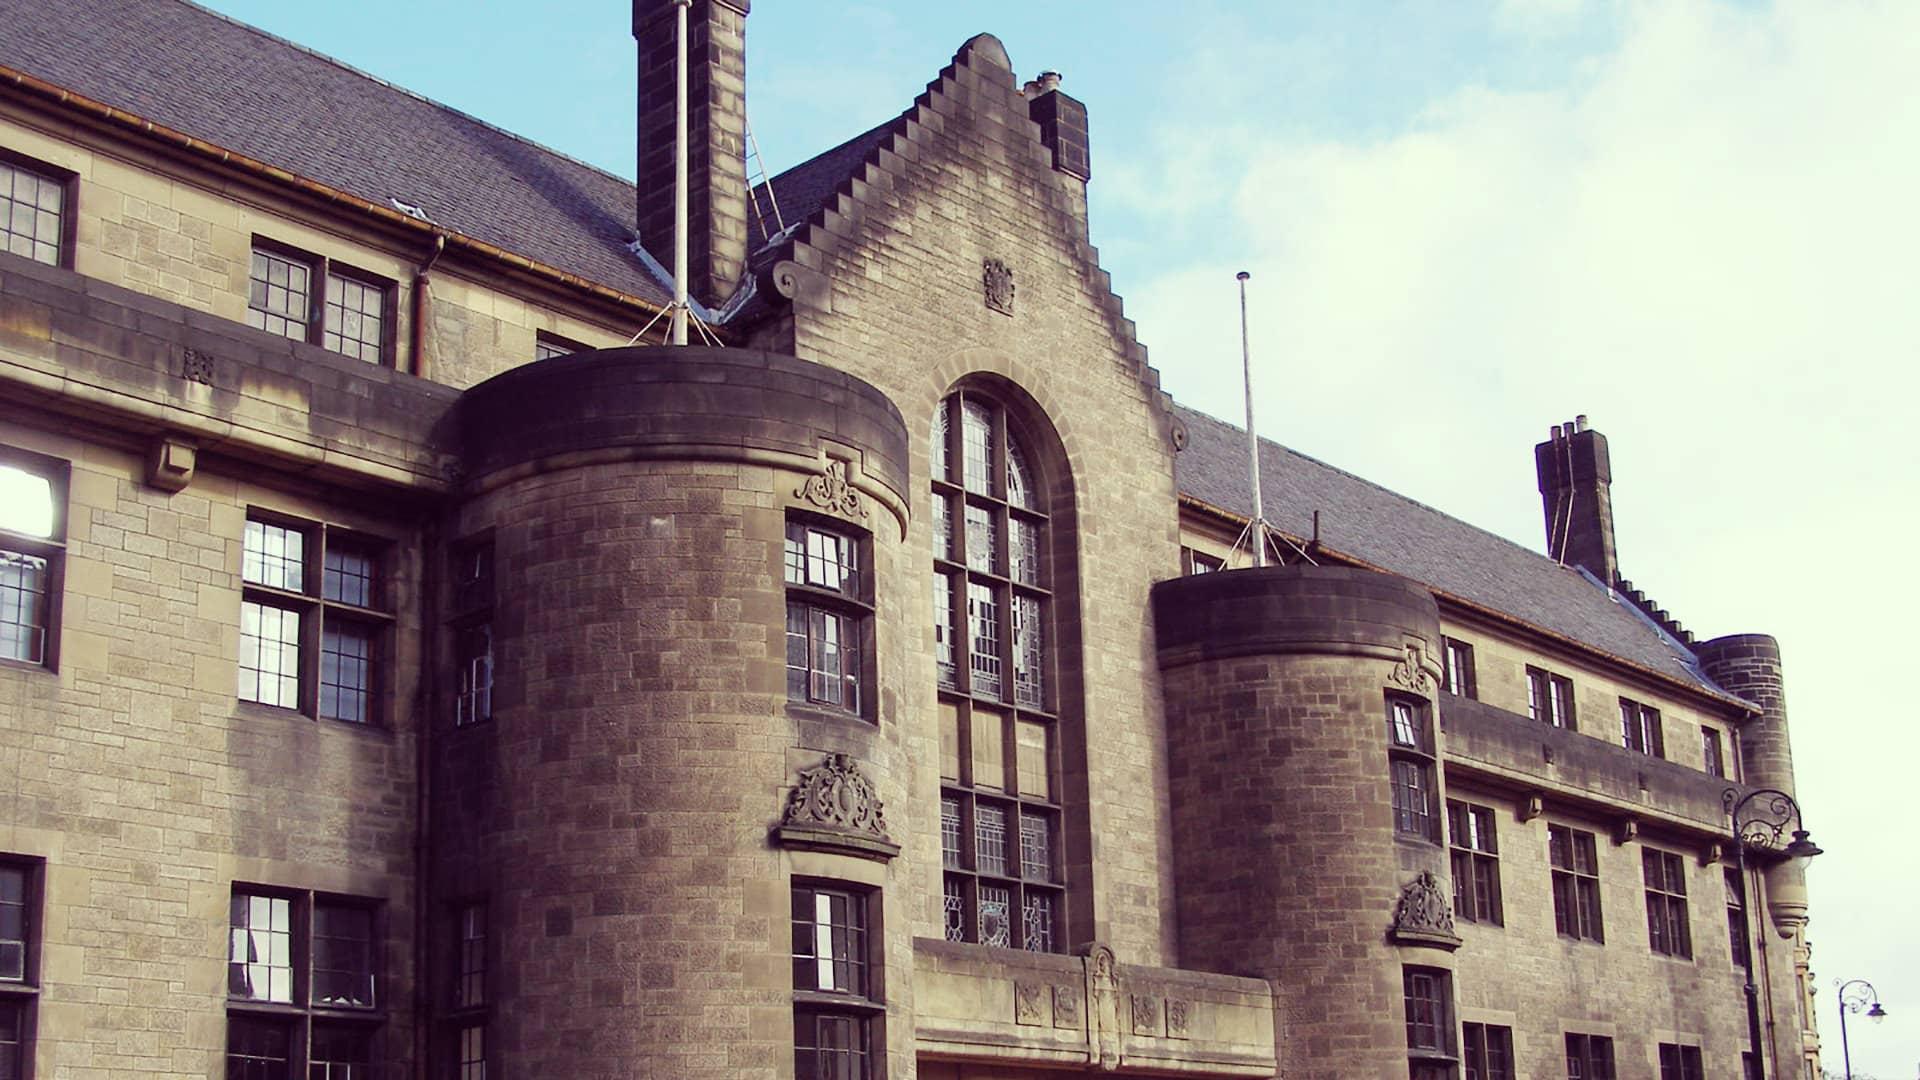 Glasgow University Union Case Study